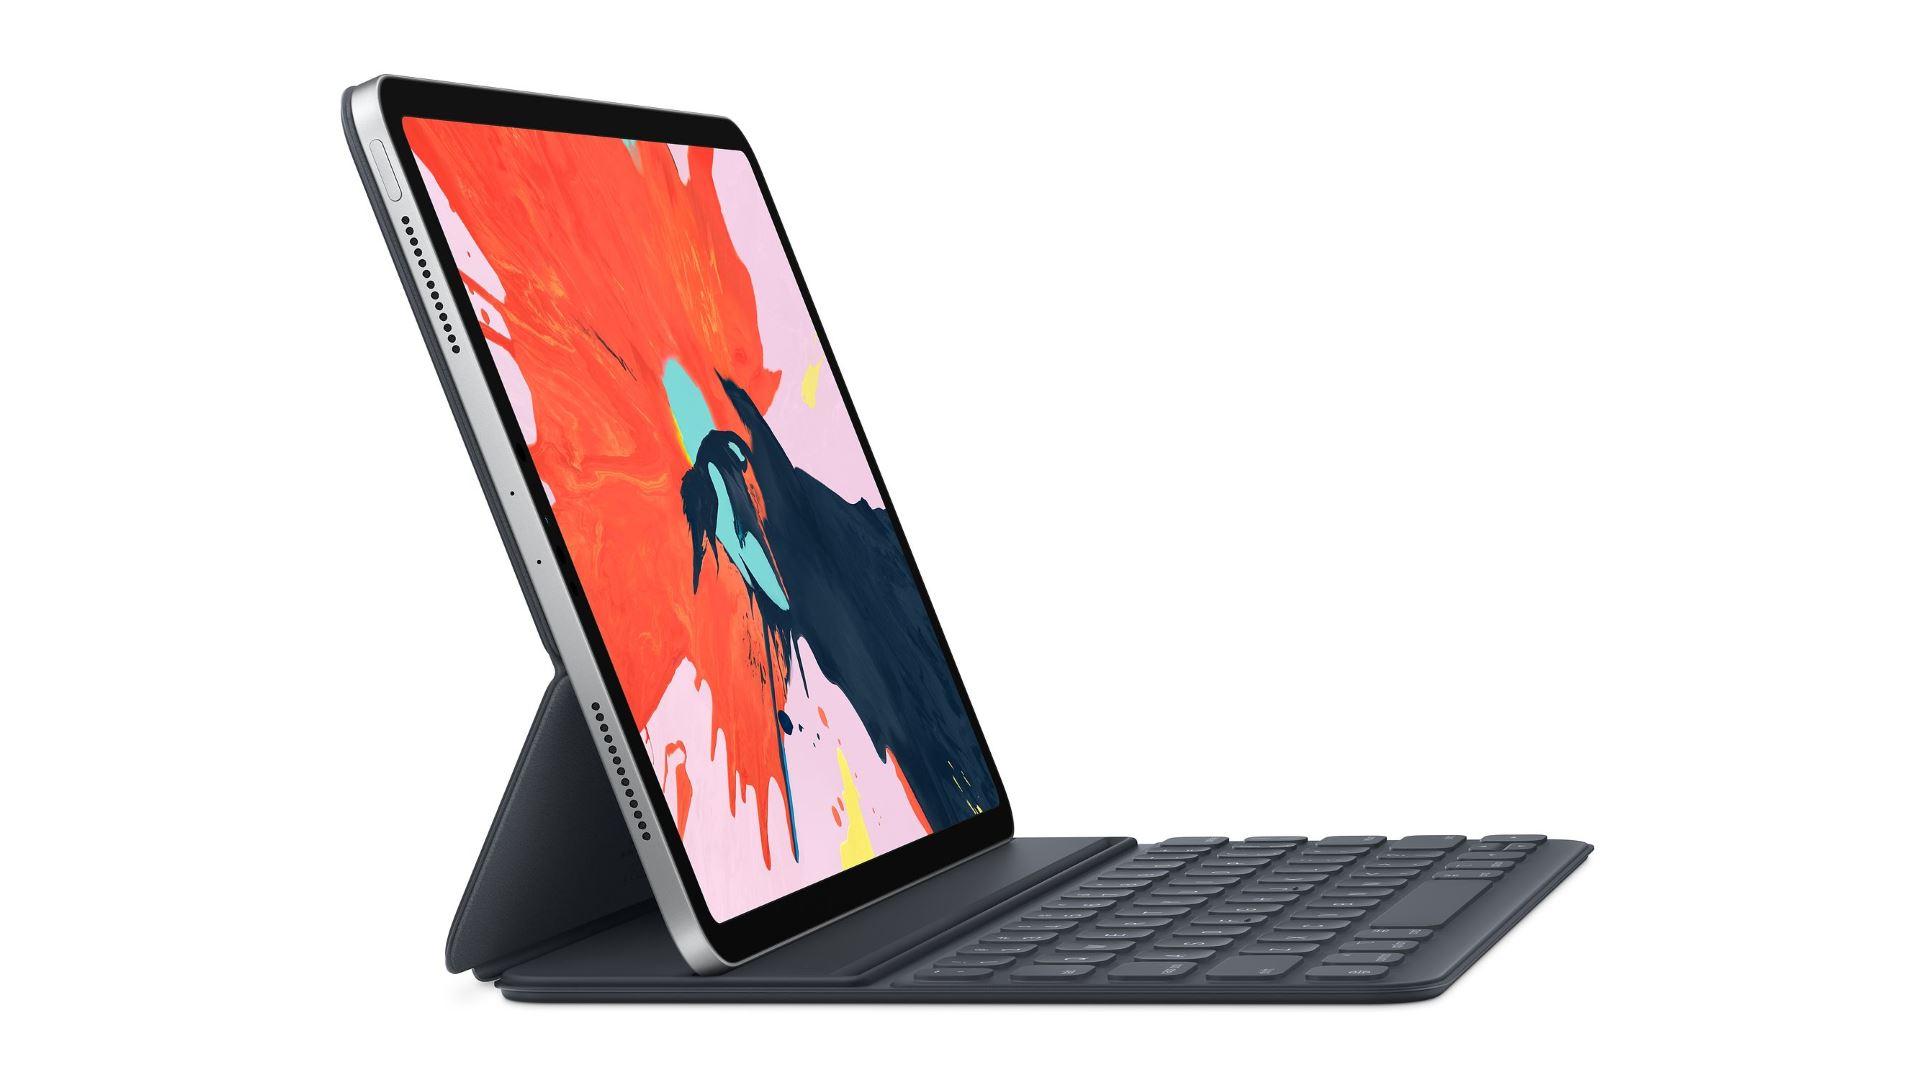 На иллюстрации изображён iPad Pro 2018 года с чехлом-клавиатурой Smart Keyboard Folio